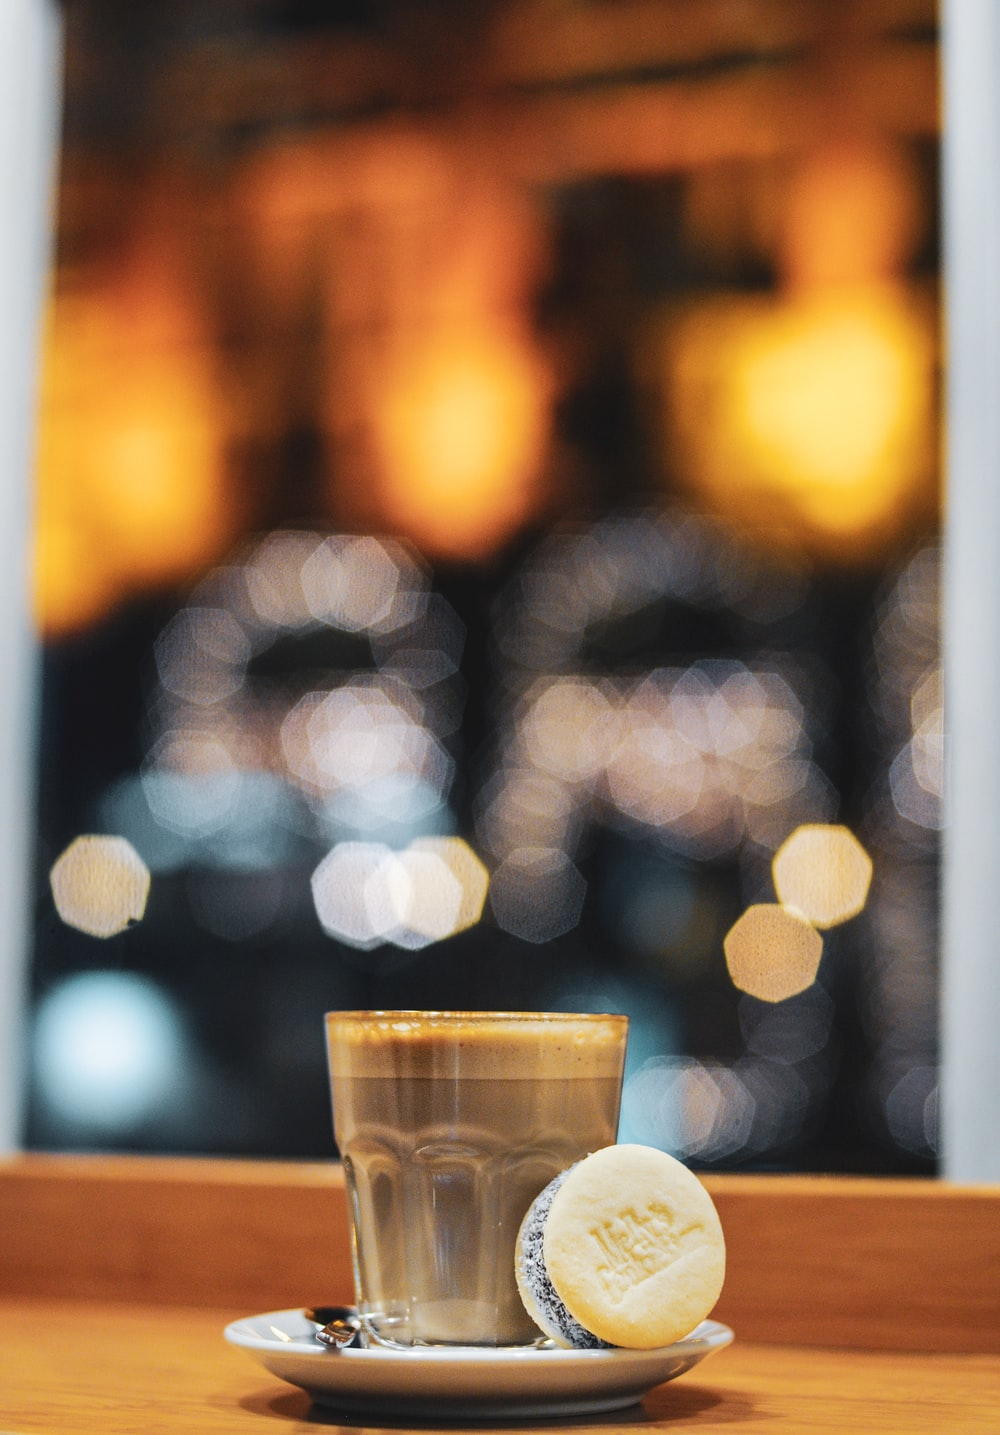 clear drinking glass beside macaroon